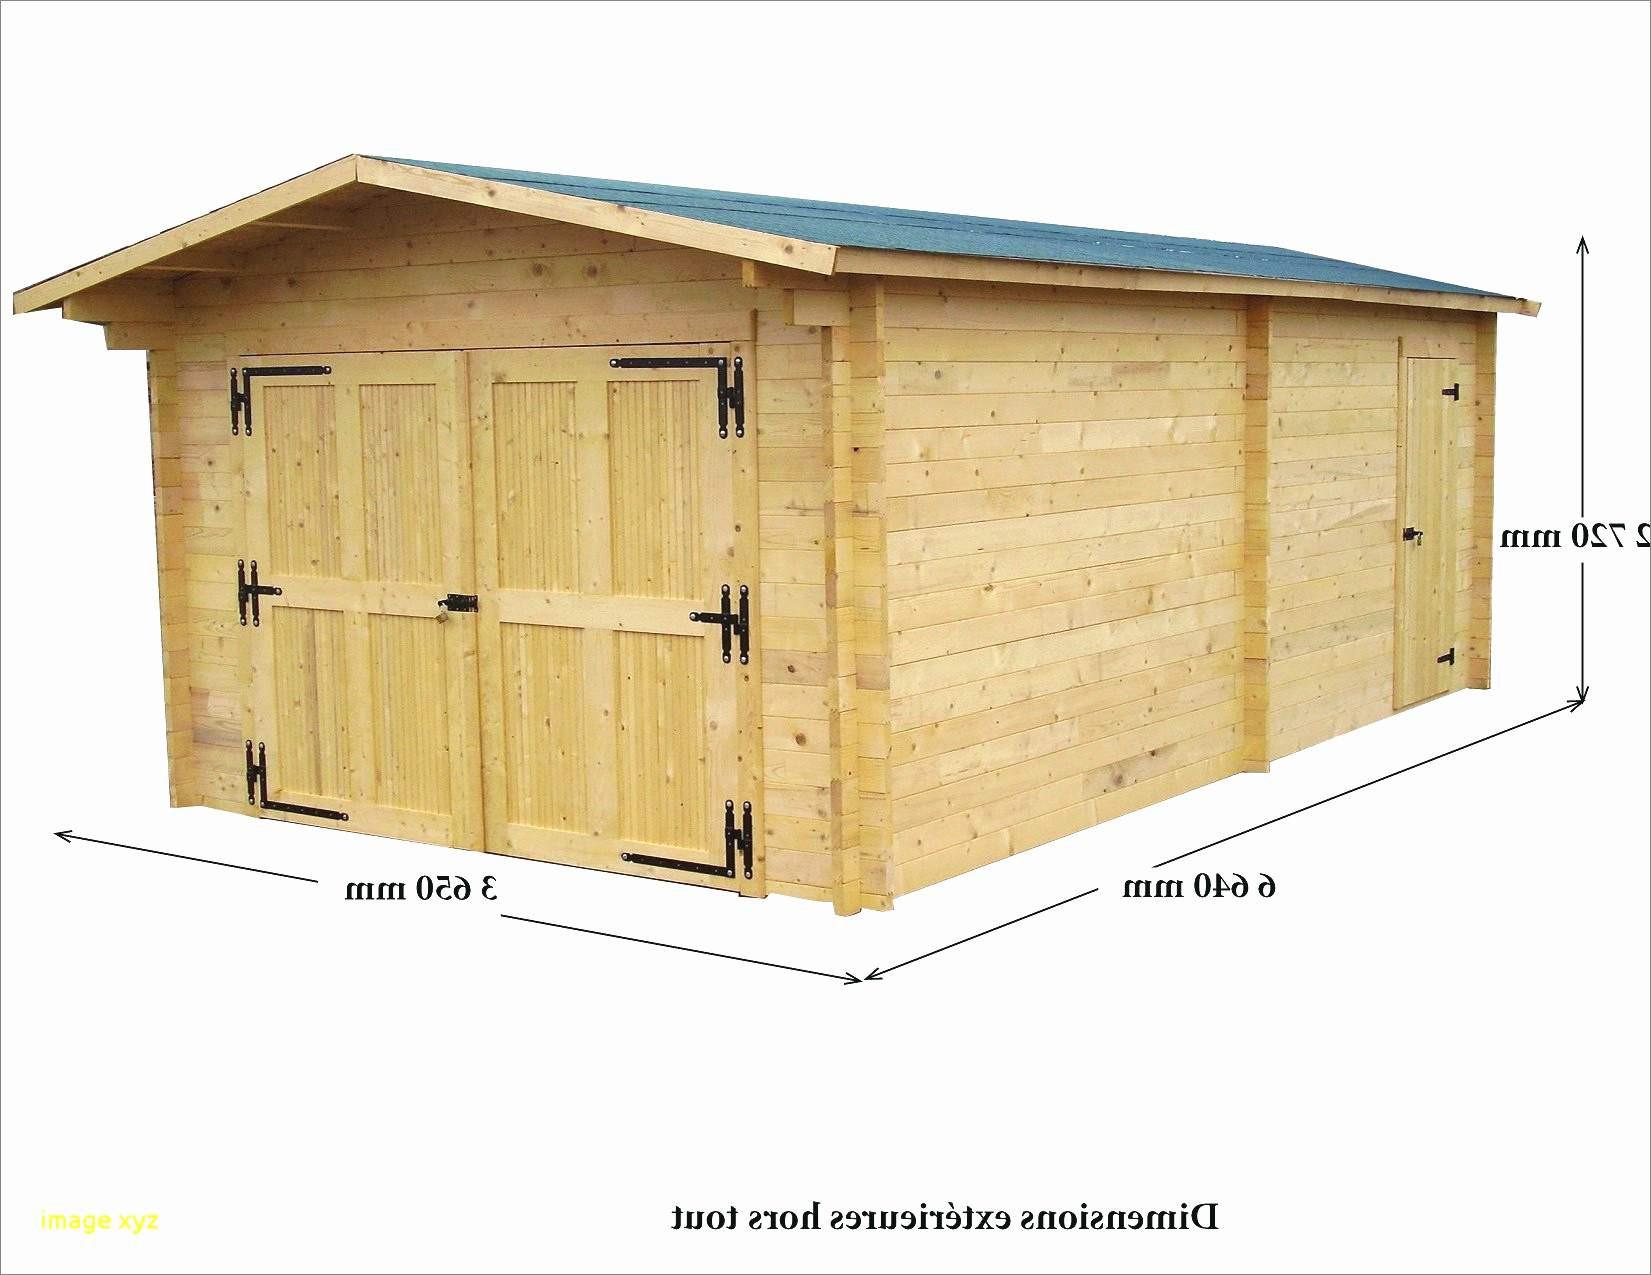 construire un abri de jardin en bois soi meme 34 luxus plan abris de jardin ossature bois elegant of construire un abri de jardin en bois soi meme